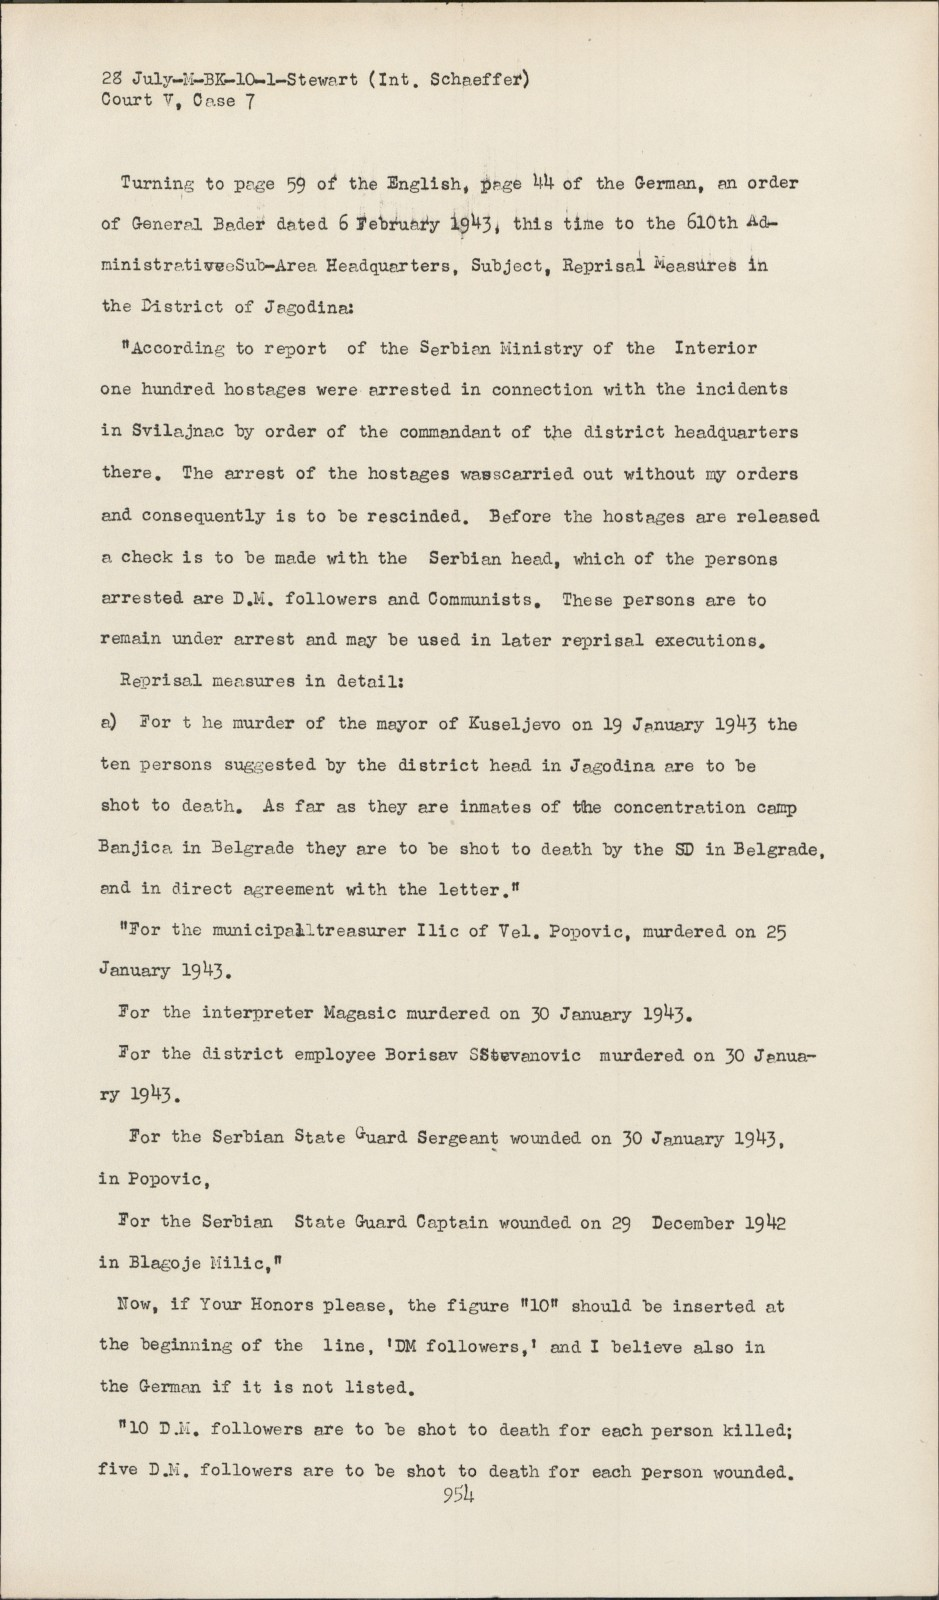 Nuremberg Transcript Viewer Transcript For Nmt 7 Hostage Case